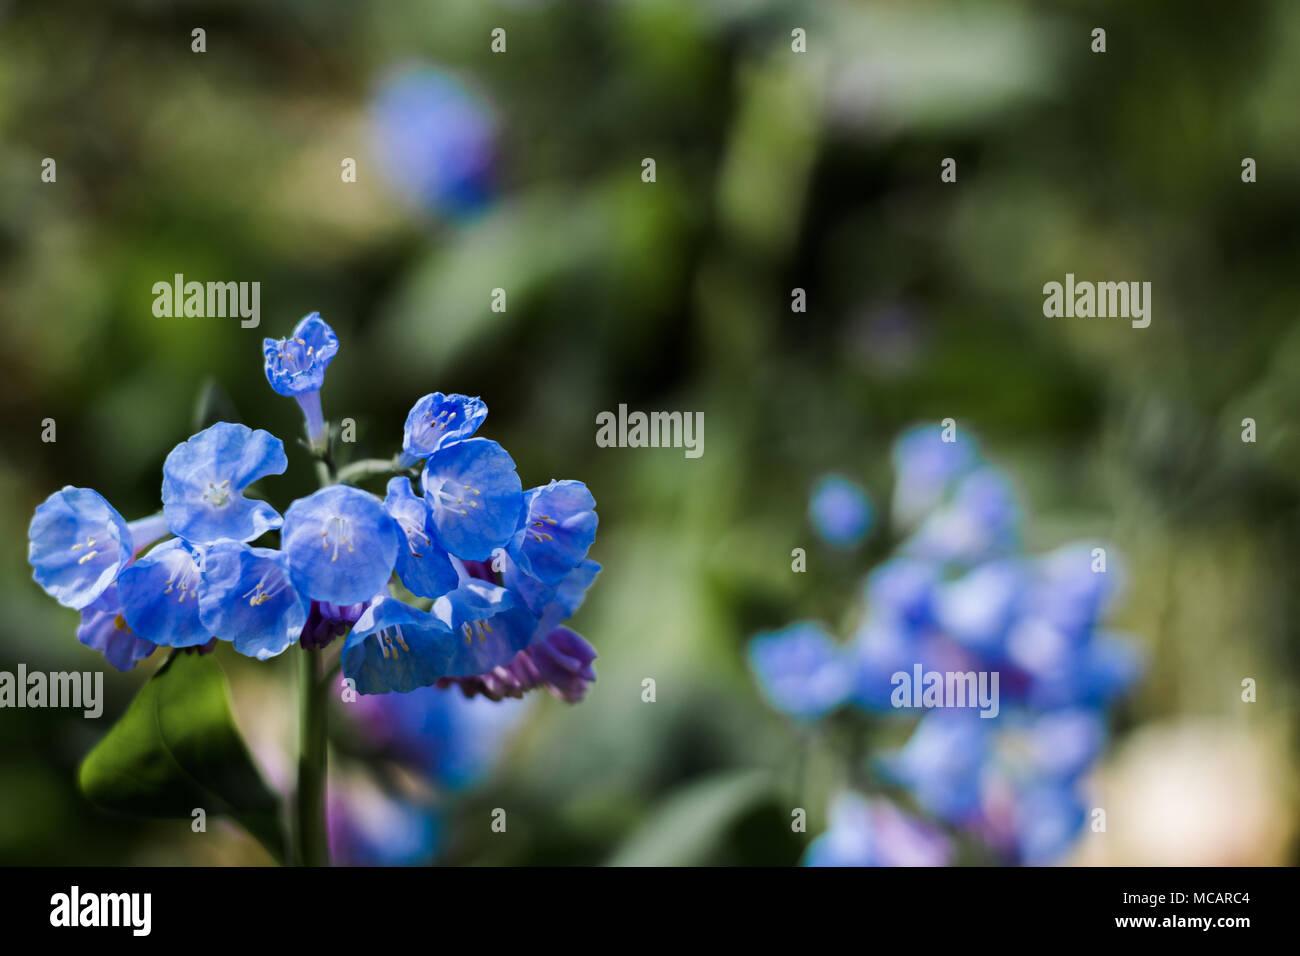 Virginia Bluebells Flowers In Bloom In Early Spring Stock Photo